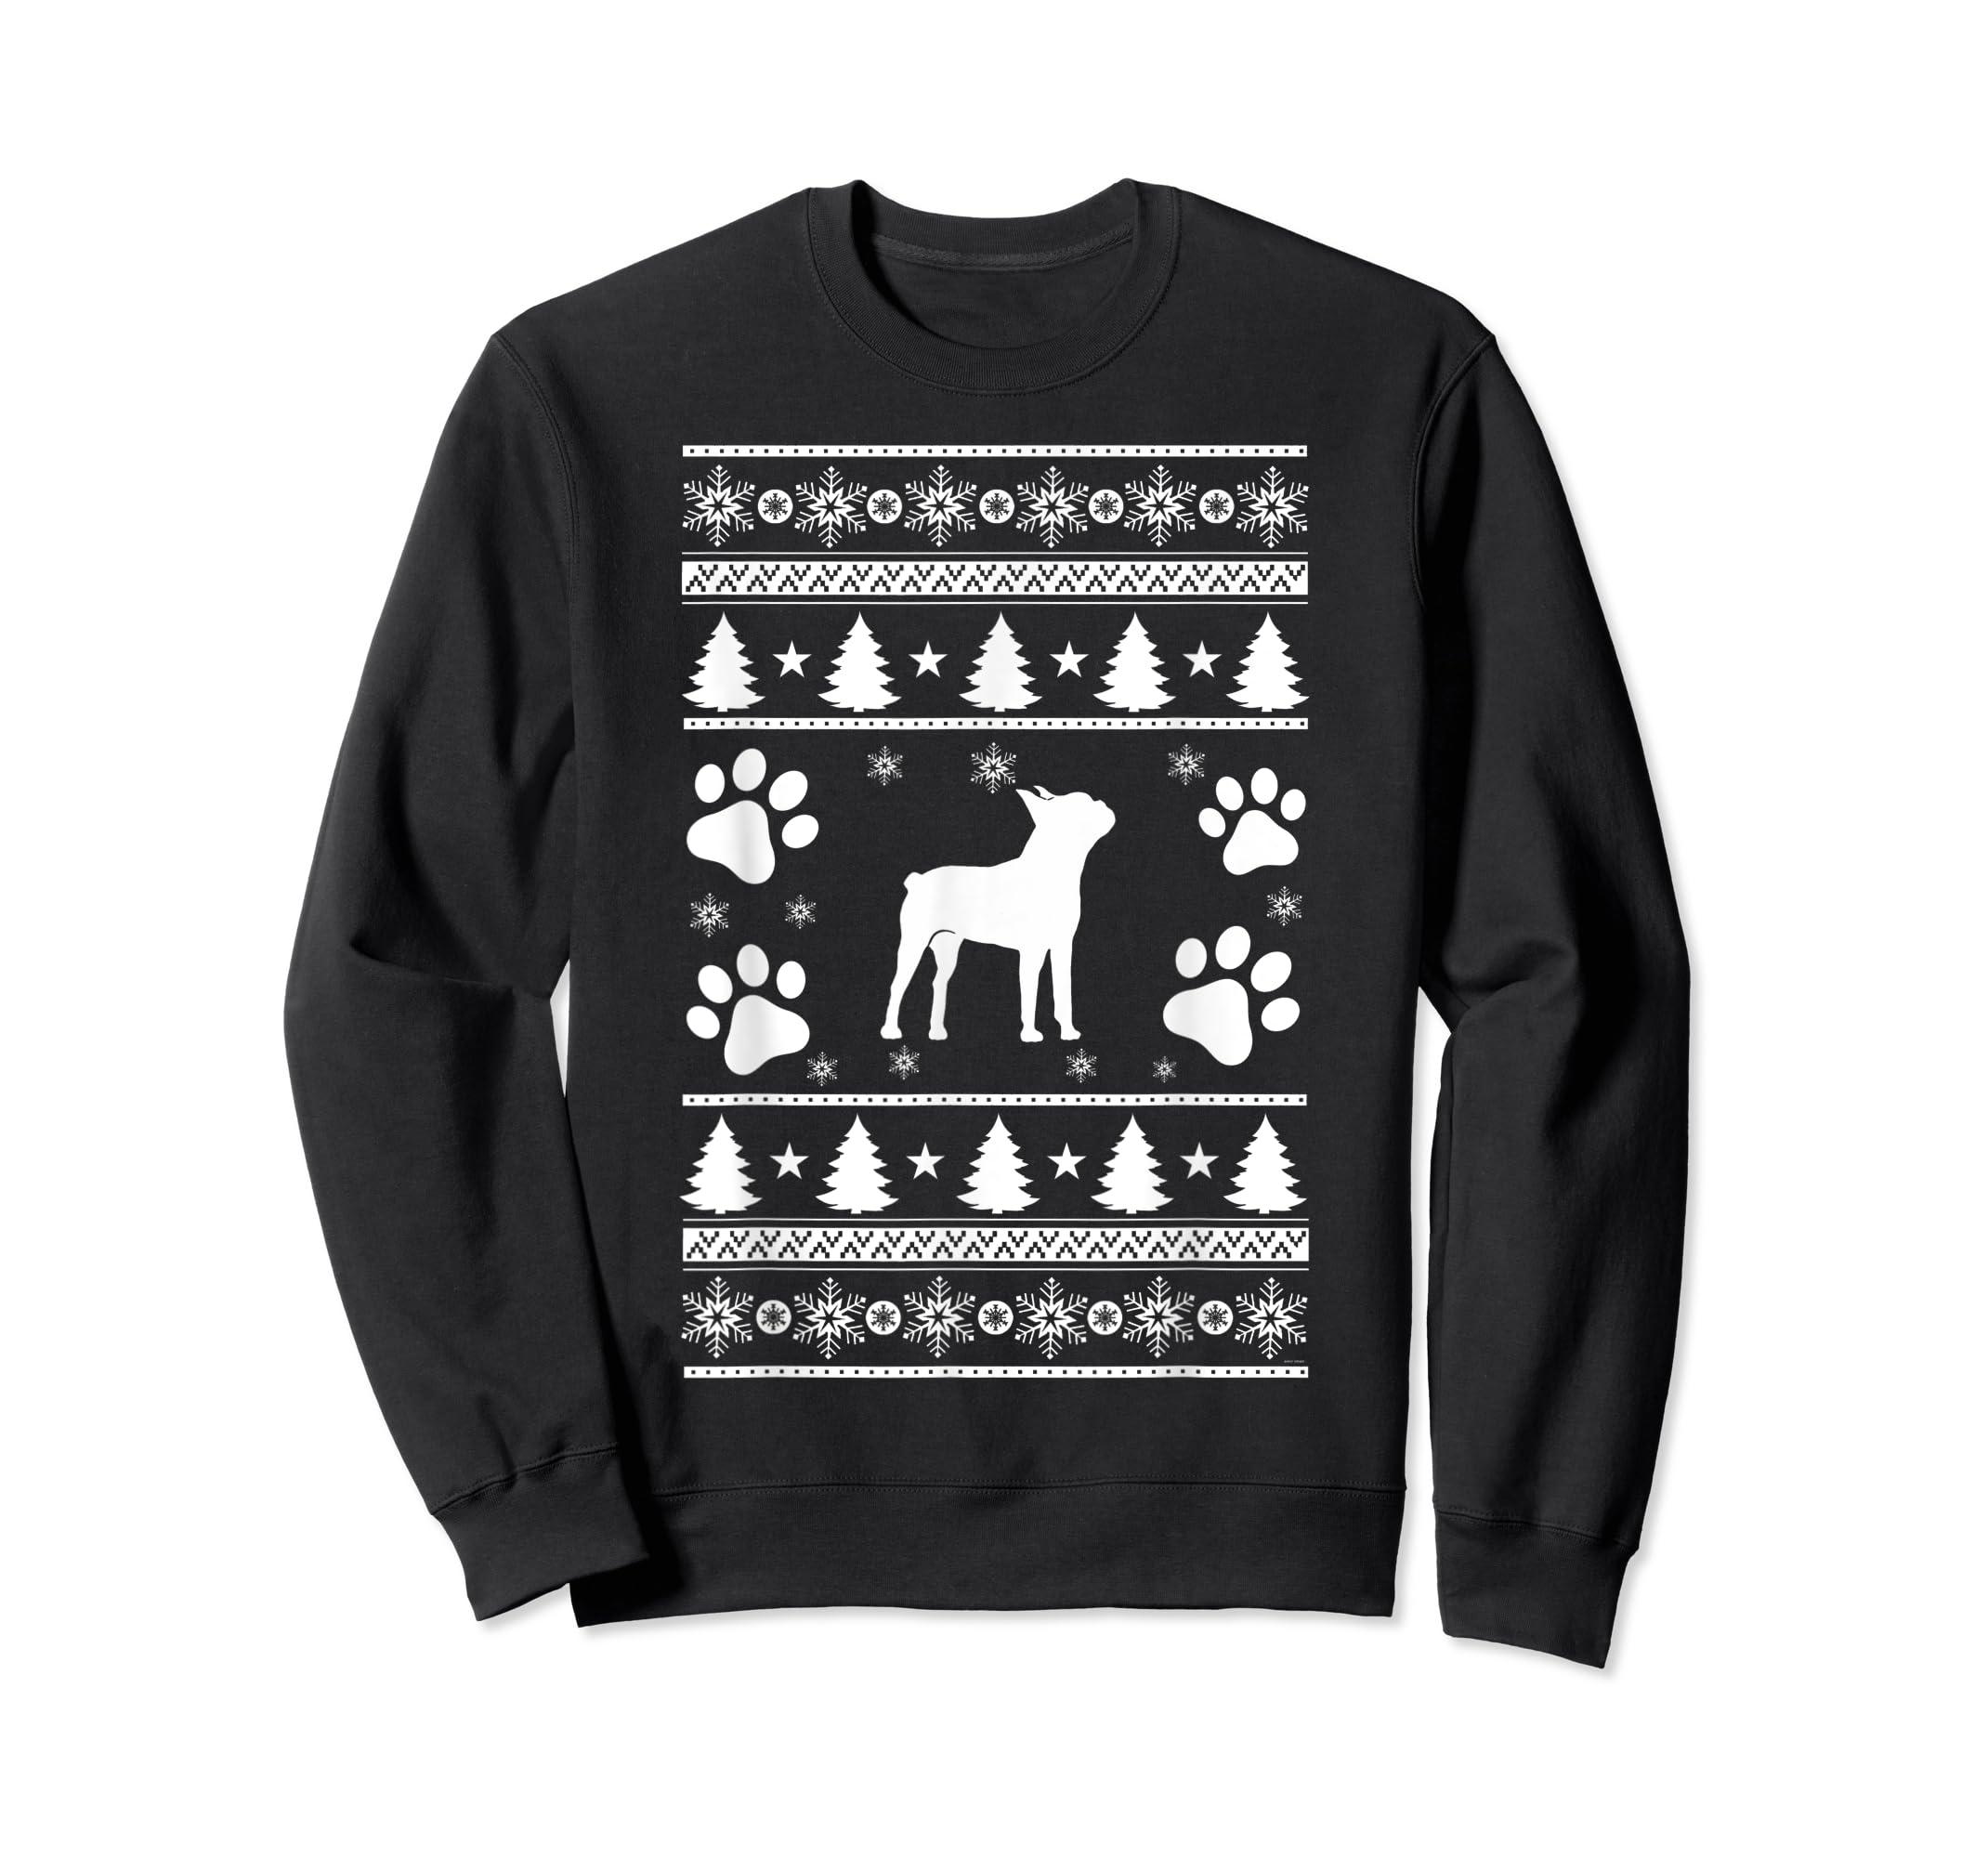 Boston Terrier lovers ugly christmas gift T-Shirt-Sweatshirt-Black